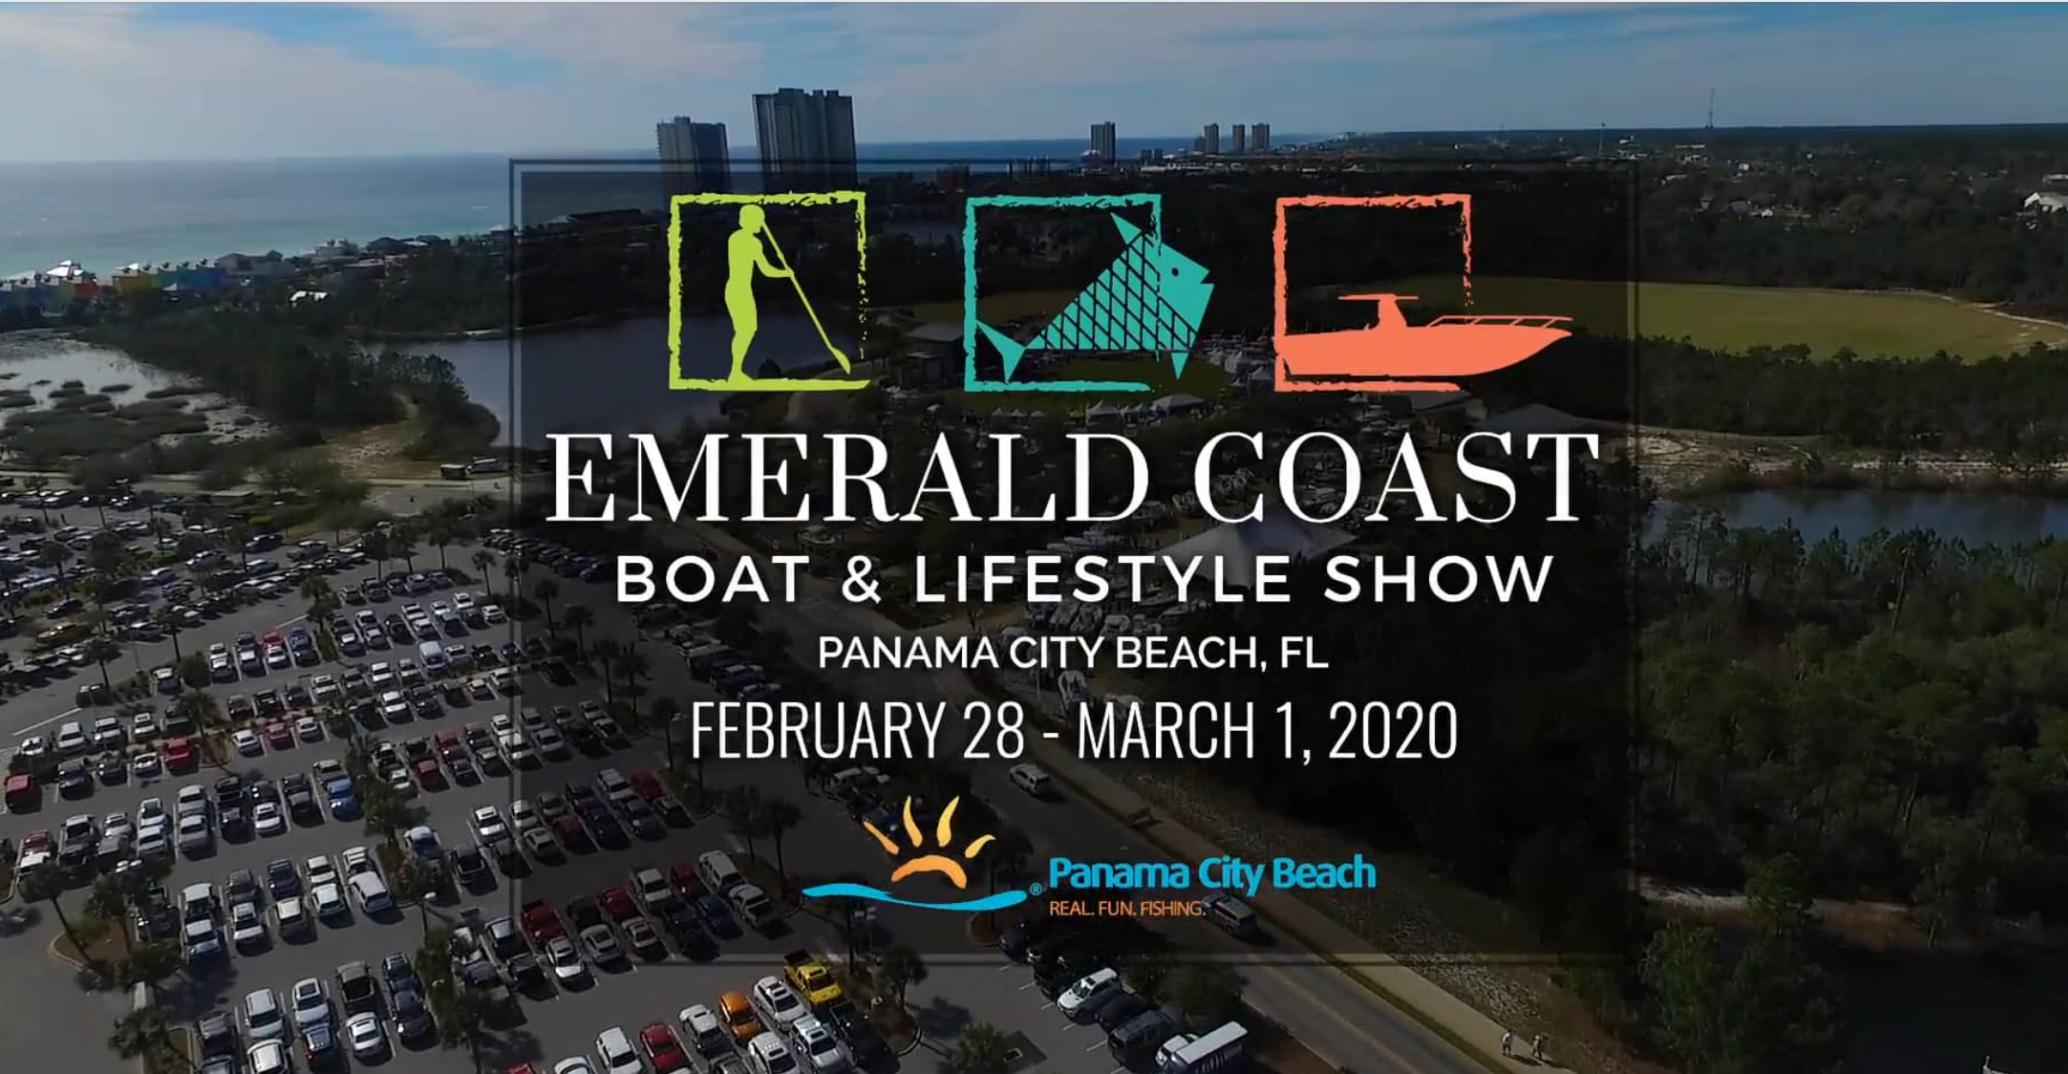 emerald coast show